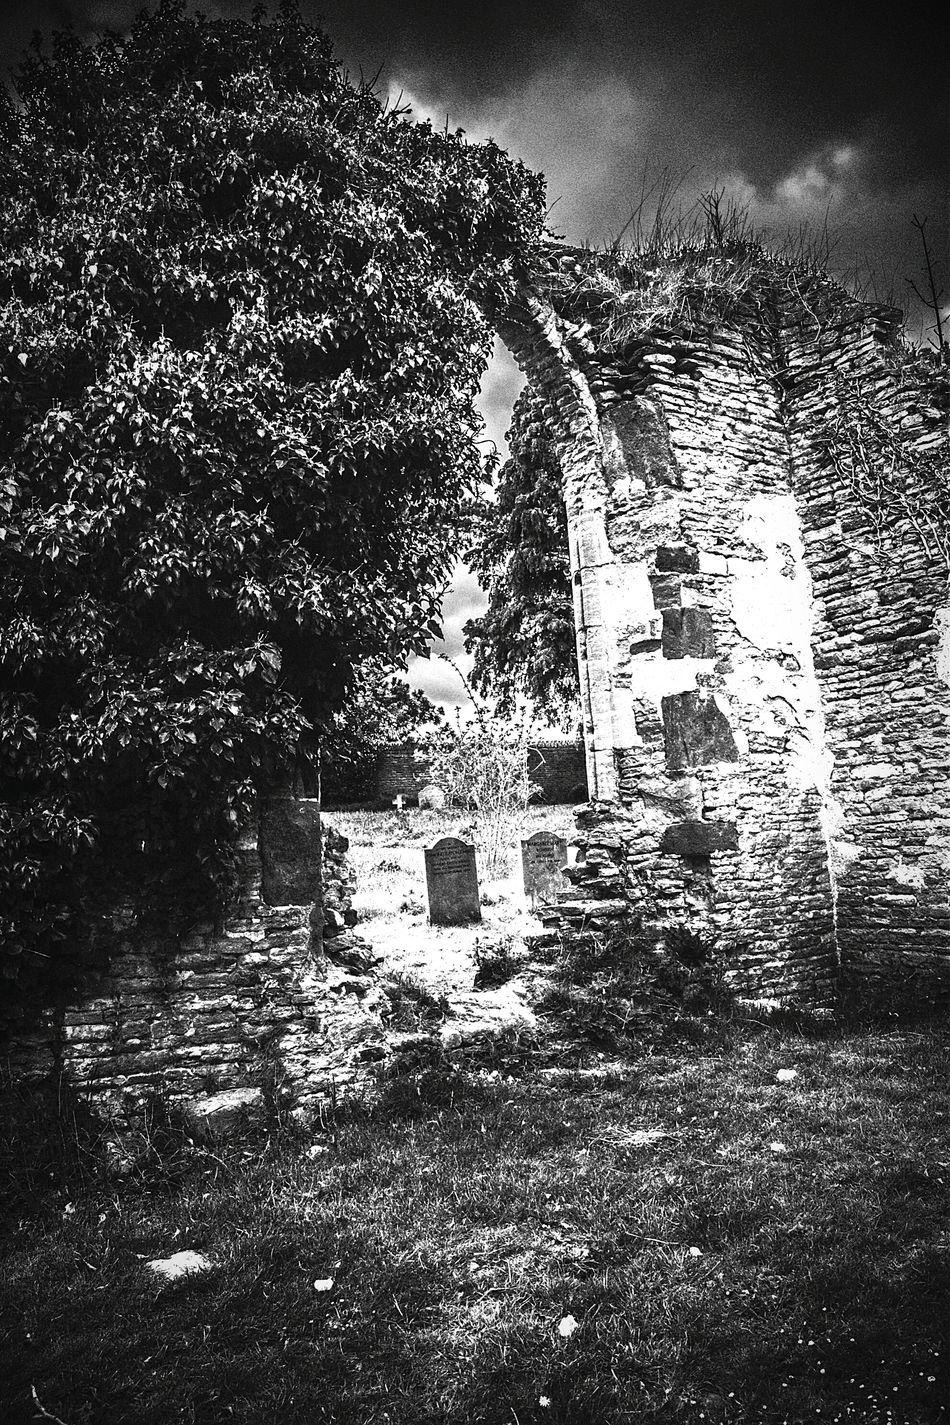 Ruins of St John's Old Church, Boughton, Northamptonshire. Blackandwhite Ruins Church Ruin Boughton Northamptonshire Archway Graveyard